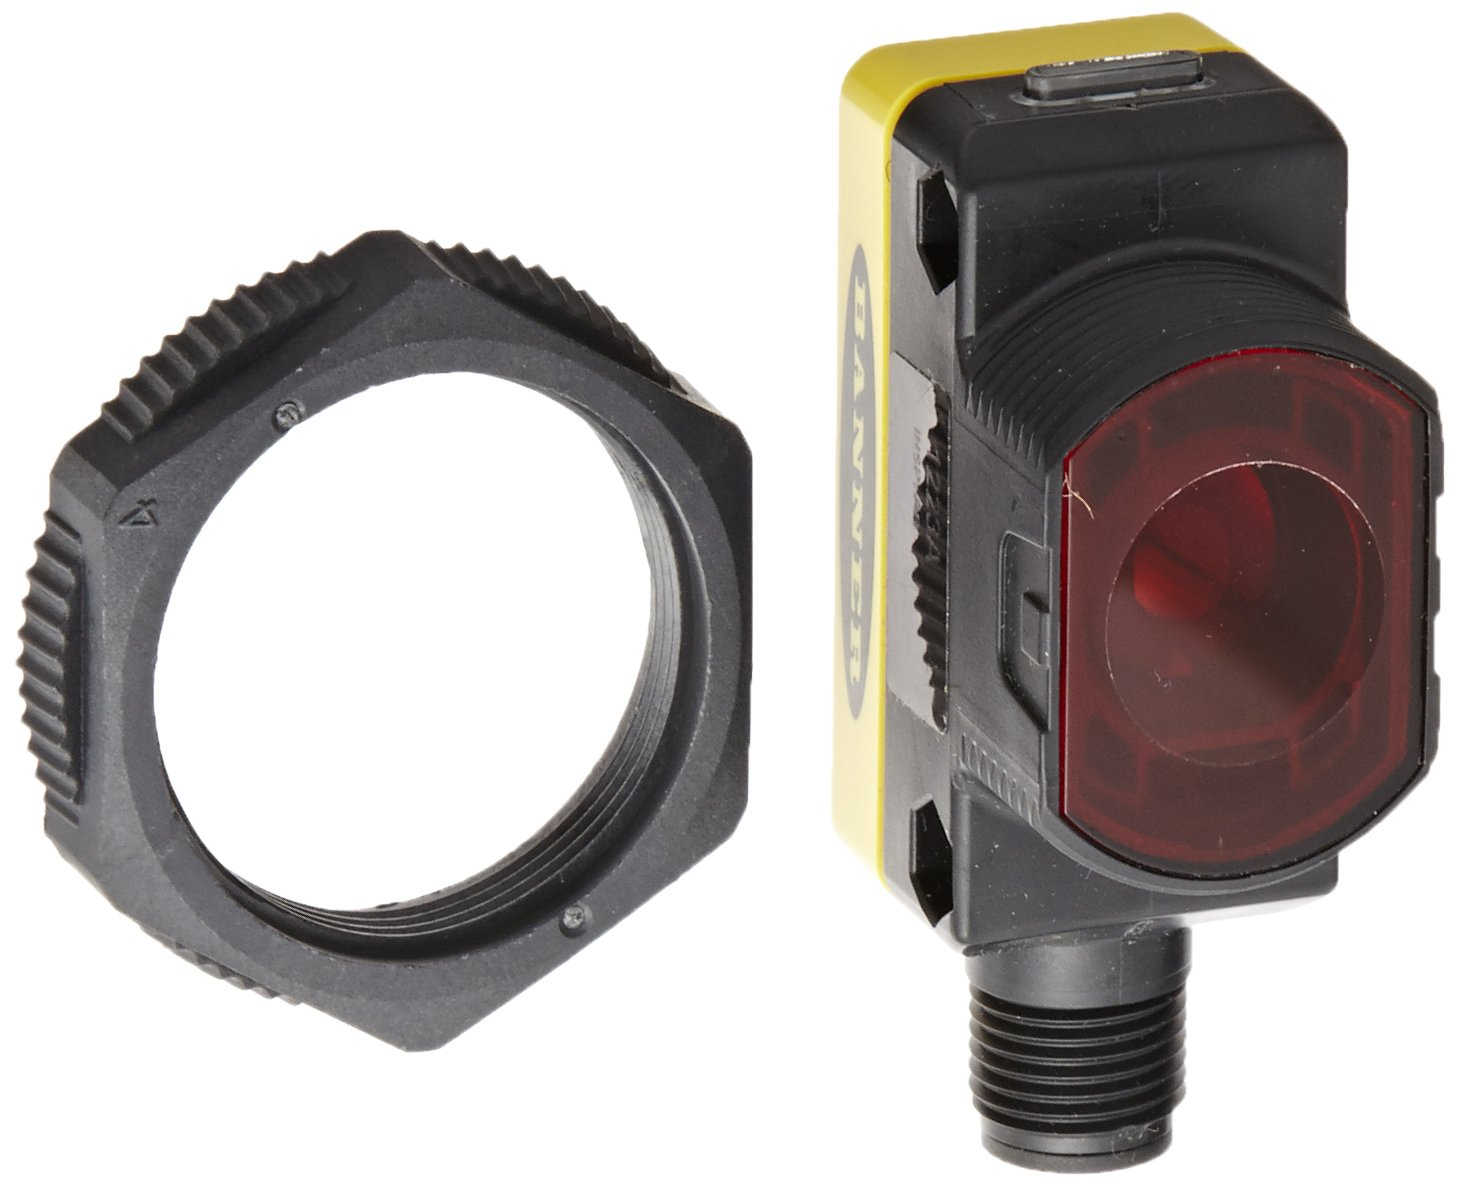 Banner QS30EQ World Beam Universal Emitter, Opposed Sensing Mode, 5-pin Integral Euro-Style QD Connection, Infrared LED, 10-30 VDC Supply Voltage, 60 m Sensing Range